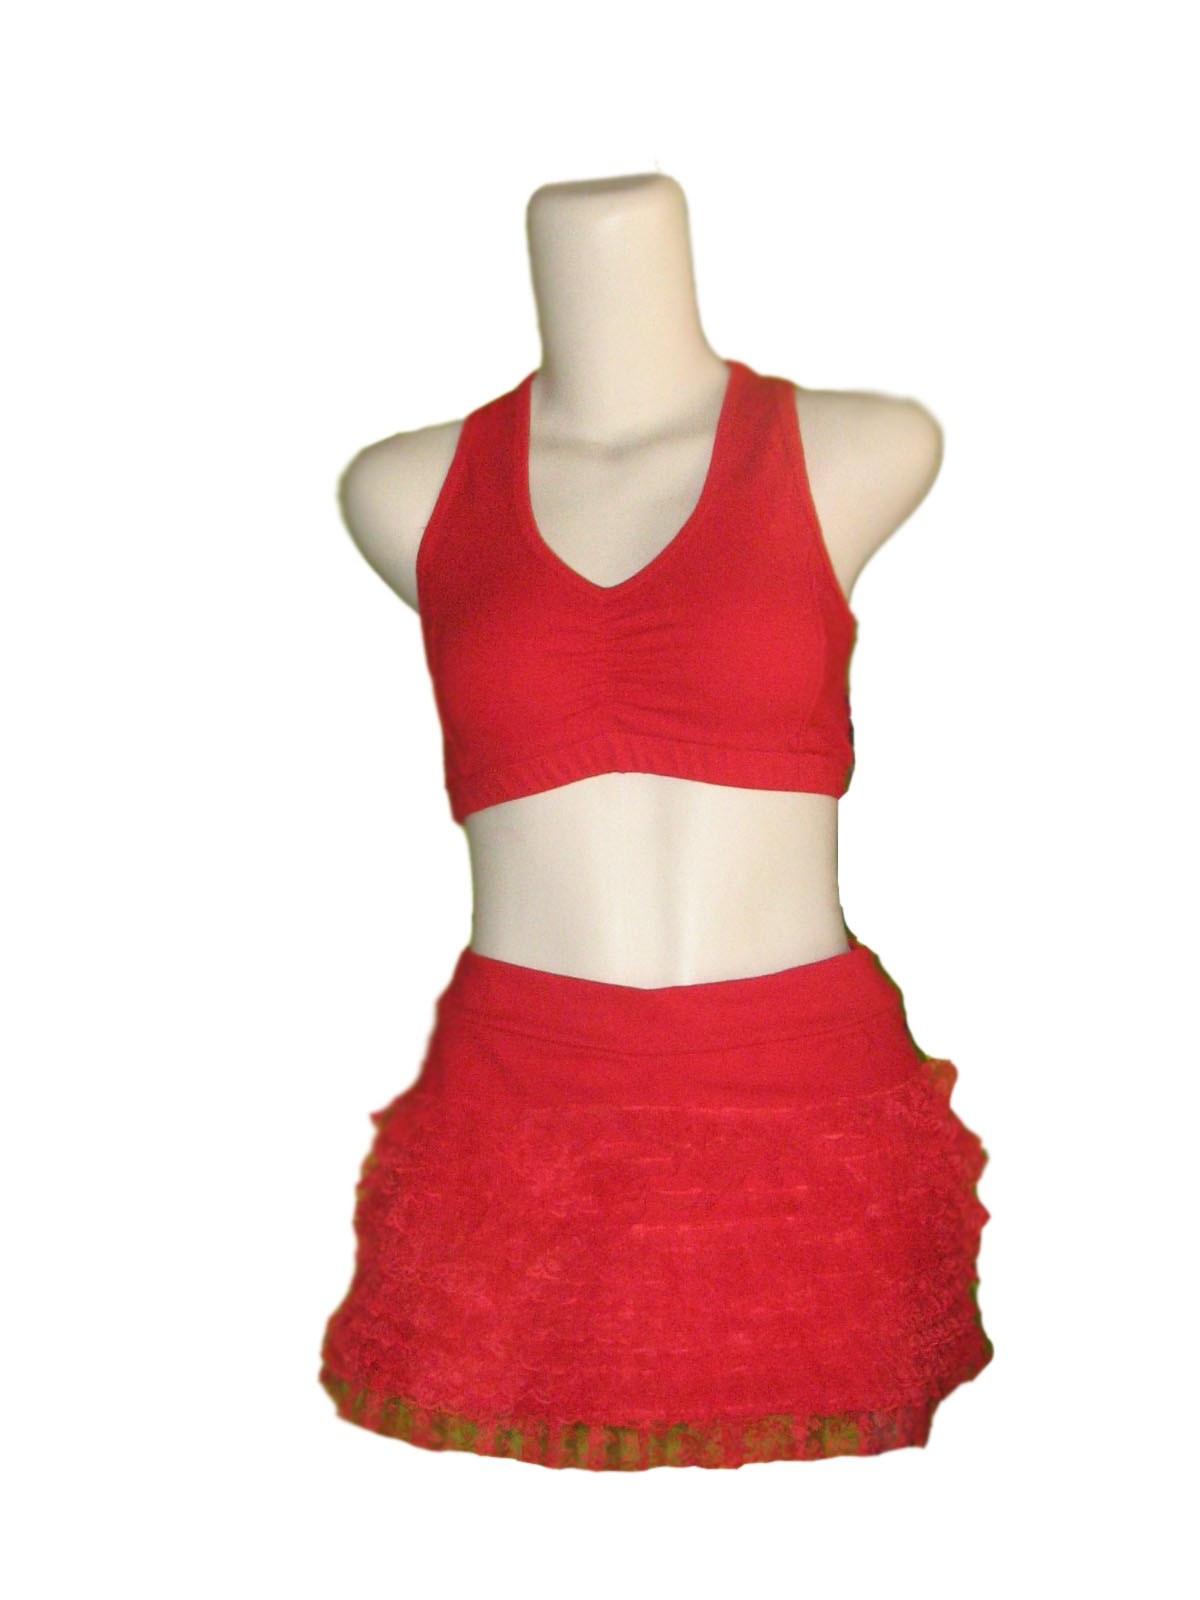 Inspirasi Baju Lebaran Yang Lagi Ngetren S5d8 Jual Baju Senam Murah